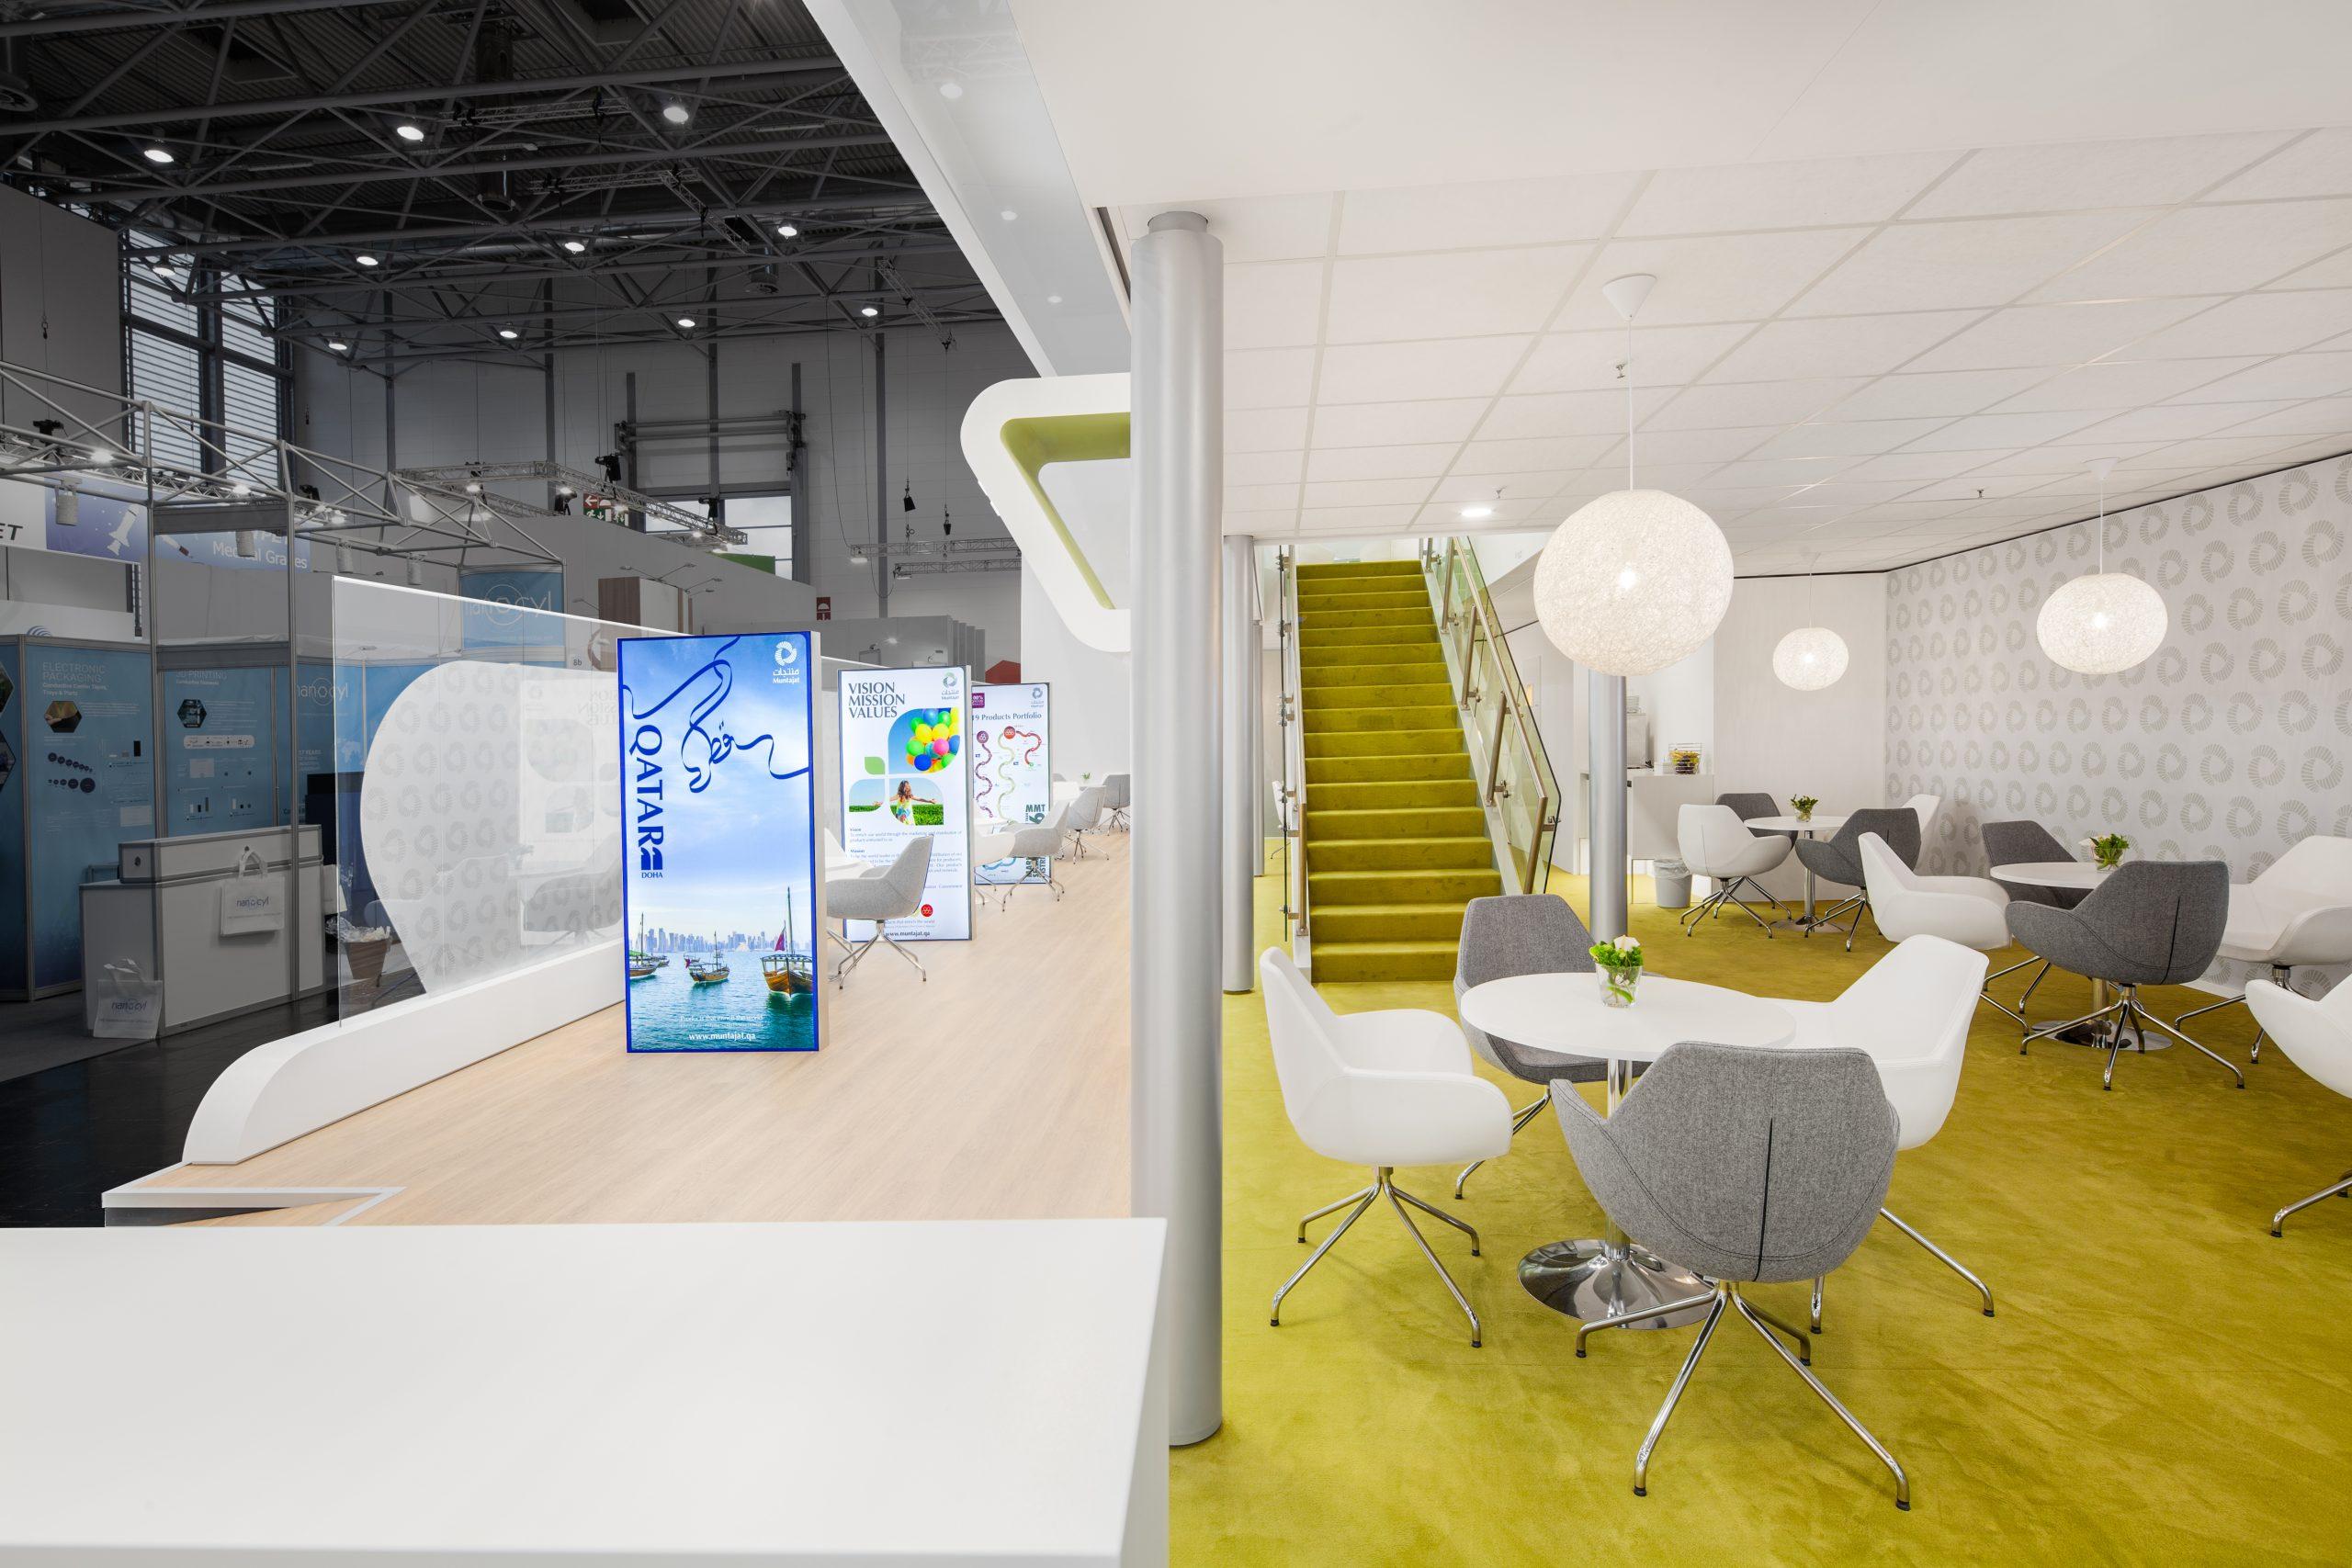 CAS Exhibition Partners - Muntajat - K 2019 - Düsseldorf - Standbouwfotografie #9457